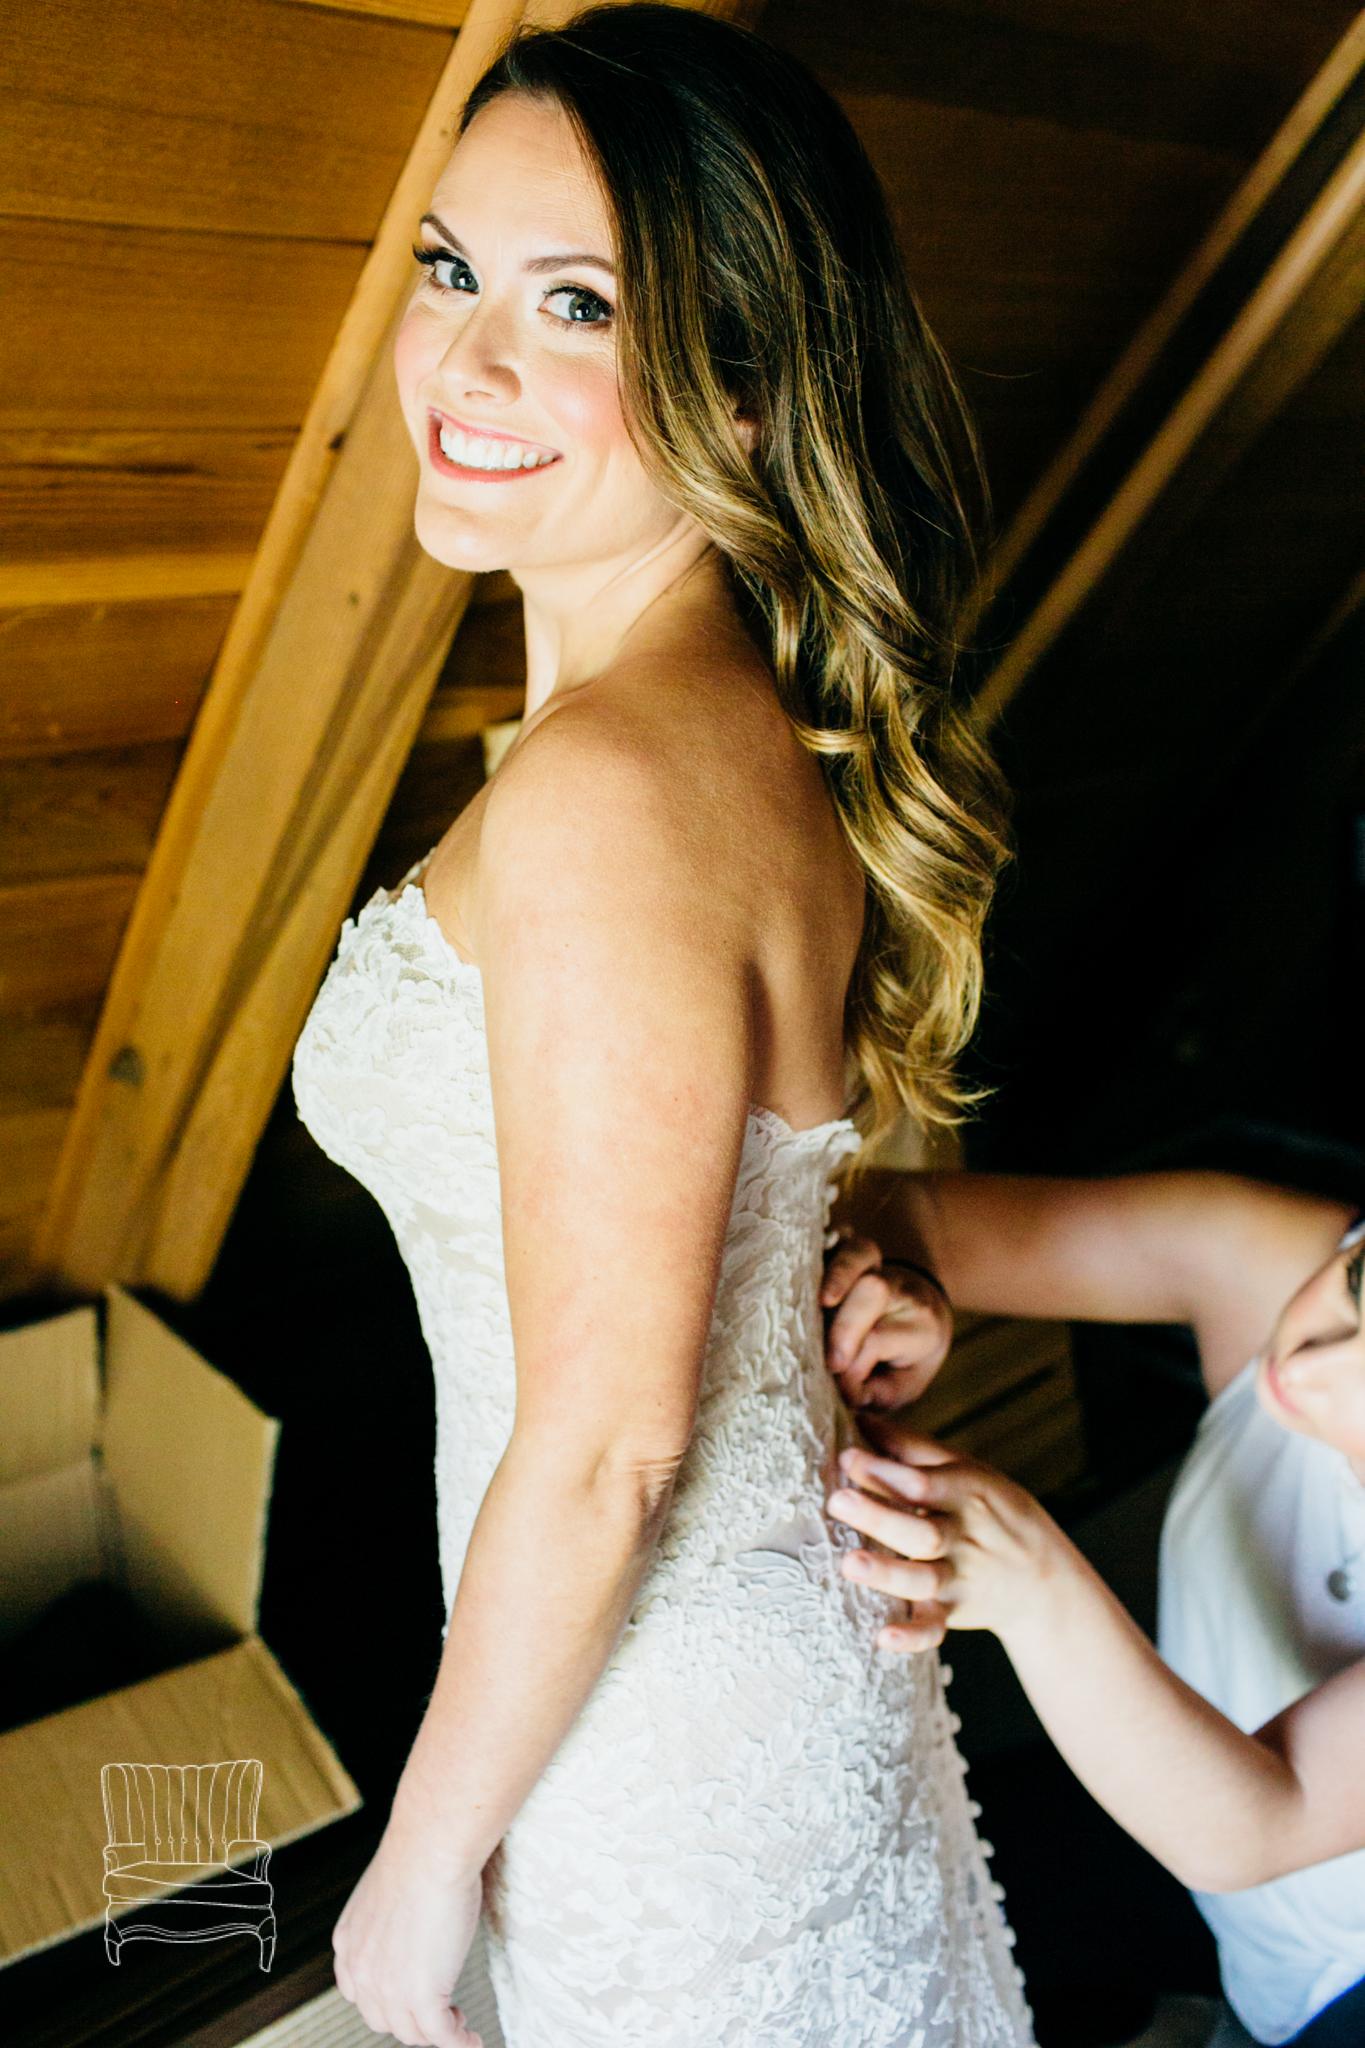 seattle-wedding-photographer-katheryn-moran-russells-bothell-wilkins-wedding-photo-9.jpg